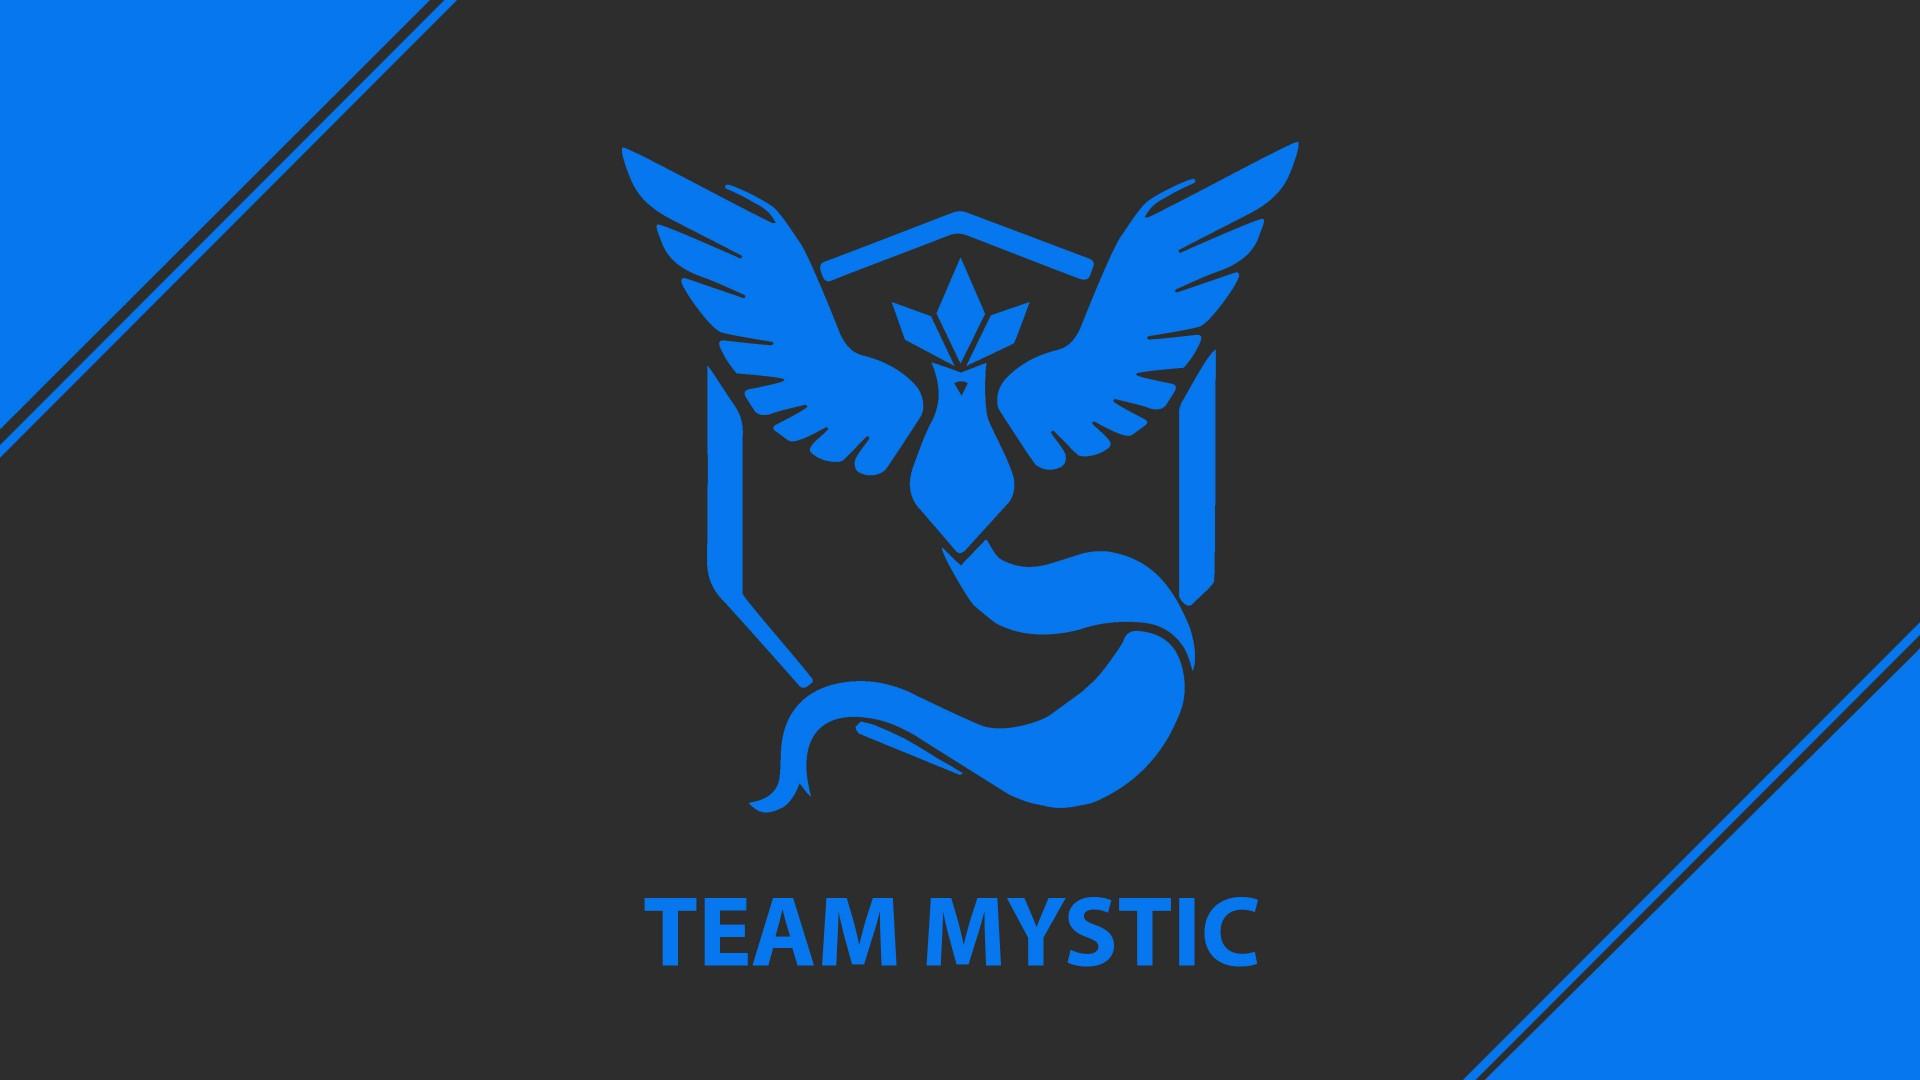 Cute Pokemon Iphone 5 Wallpaper Pokemon Go Team Mystic Team Blue 4k Wallpapers Hd